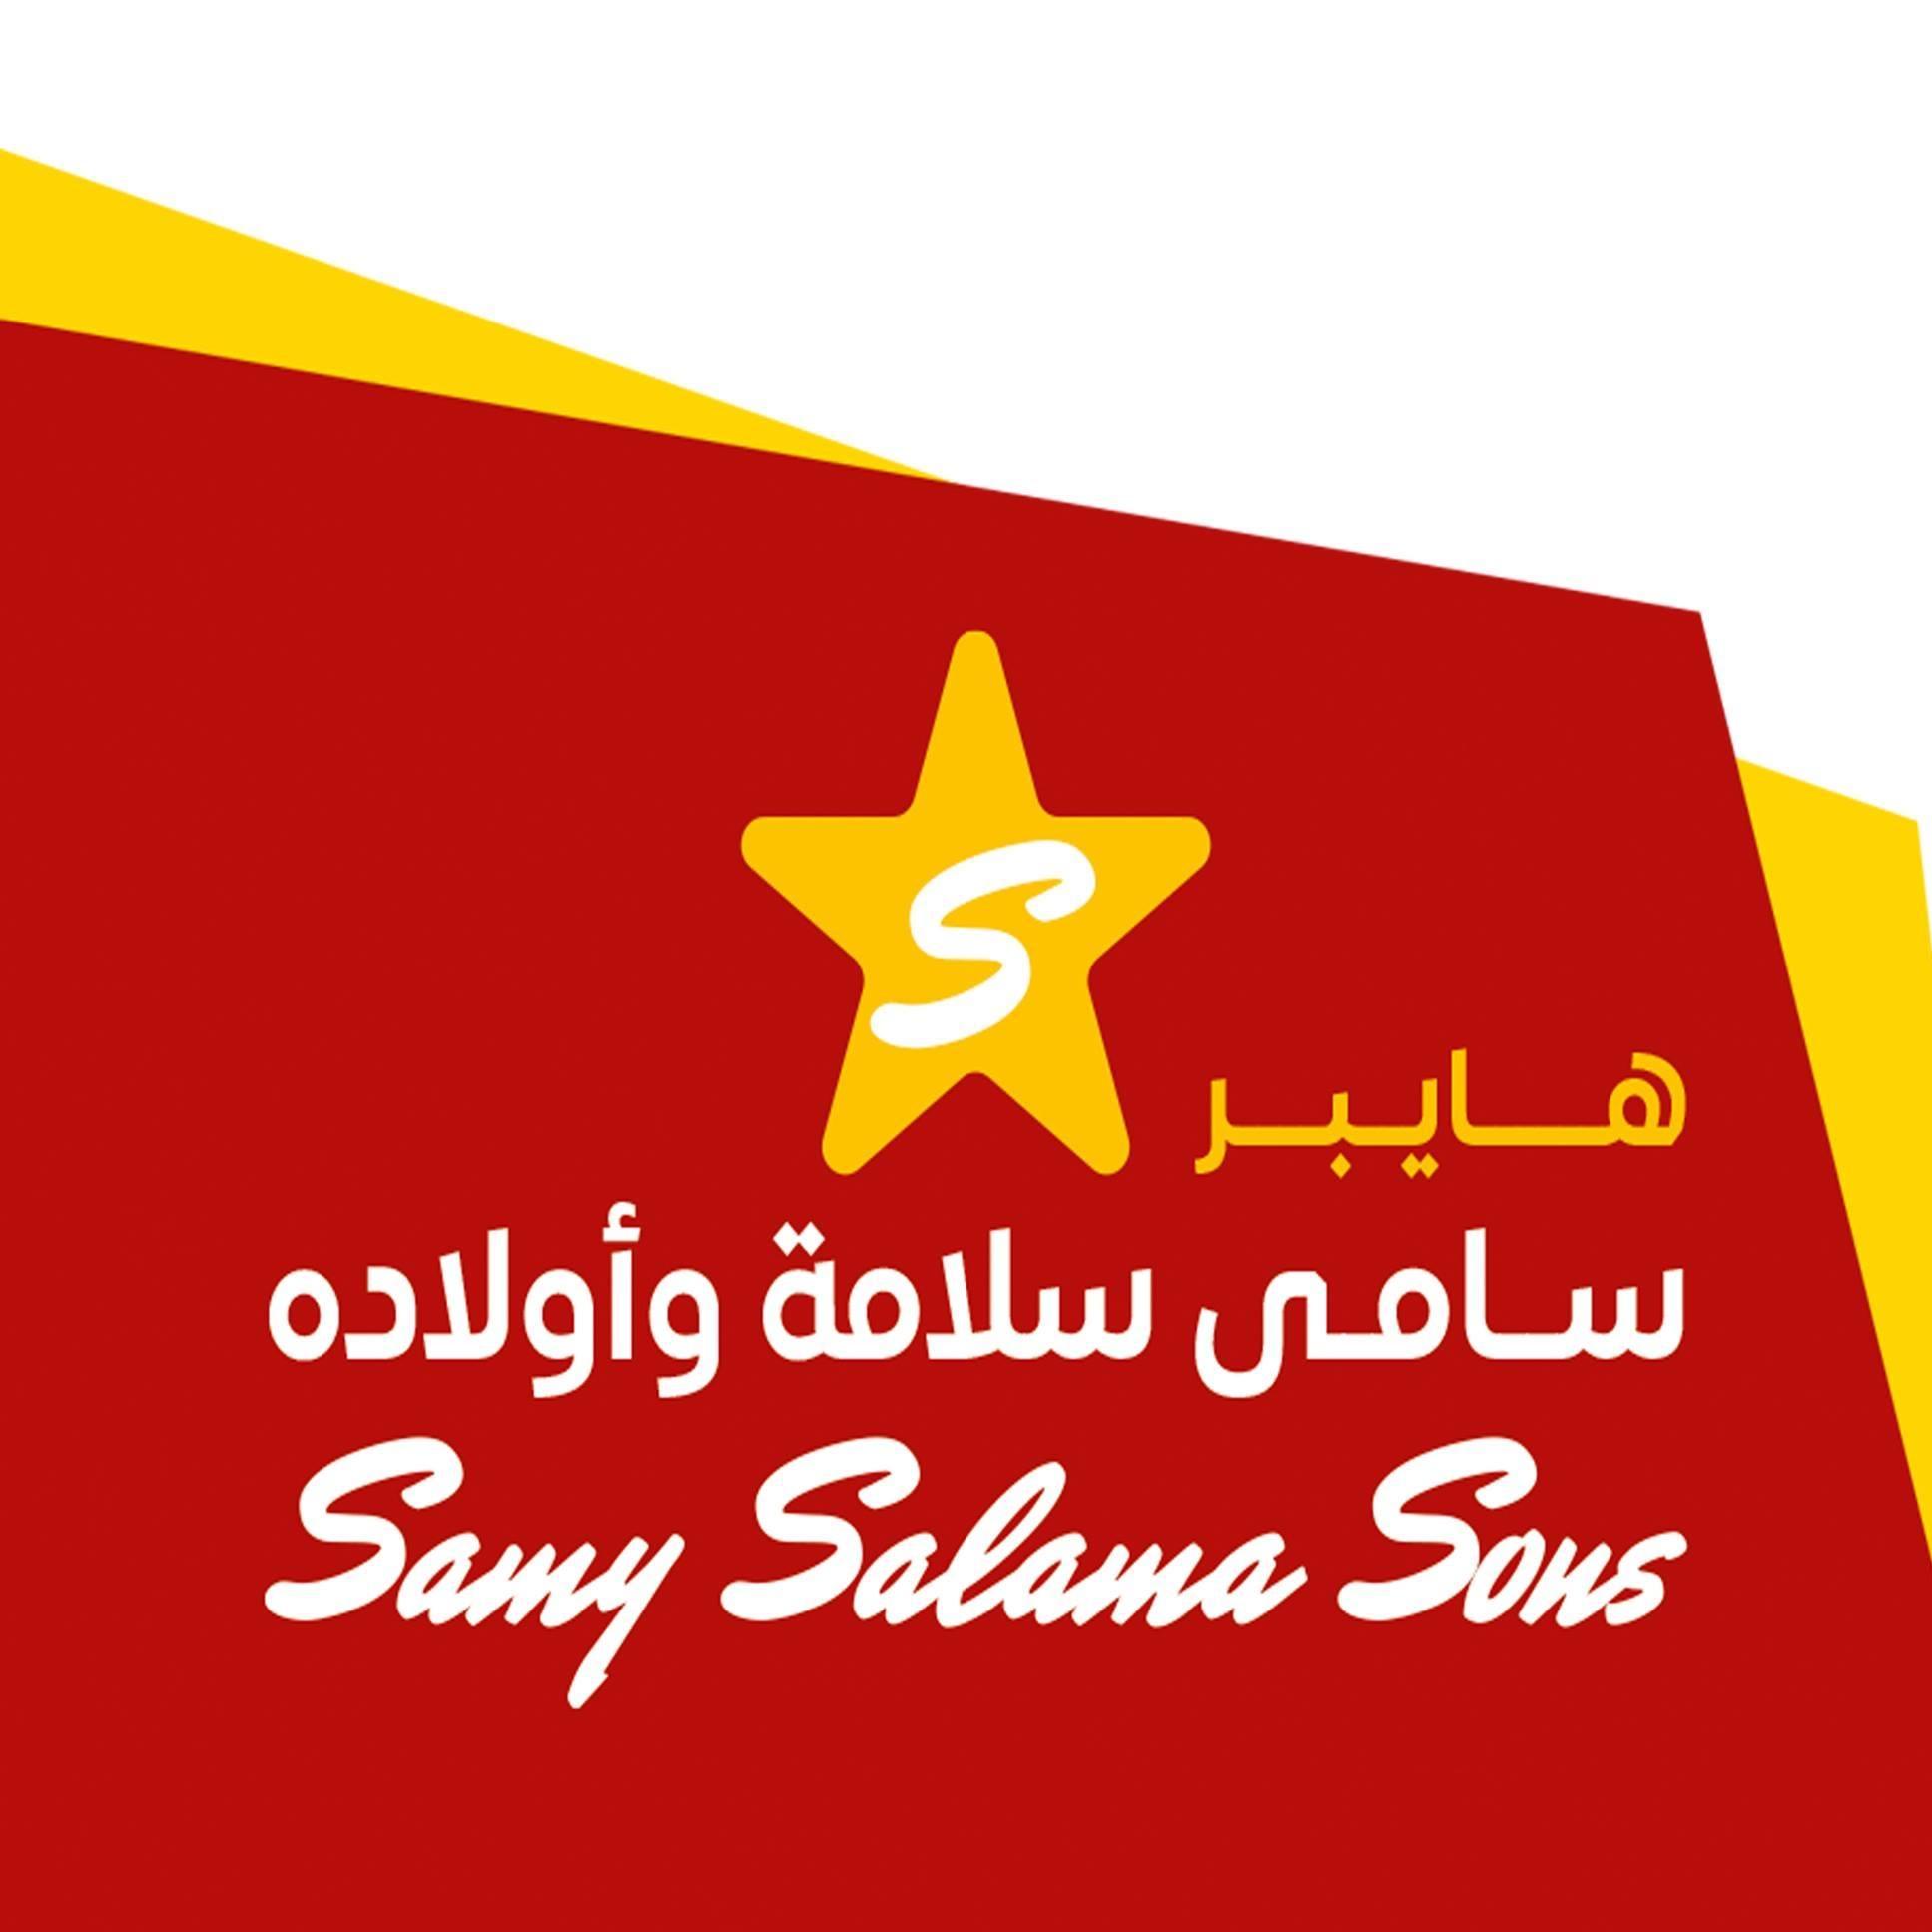 Samy Salama Sons